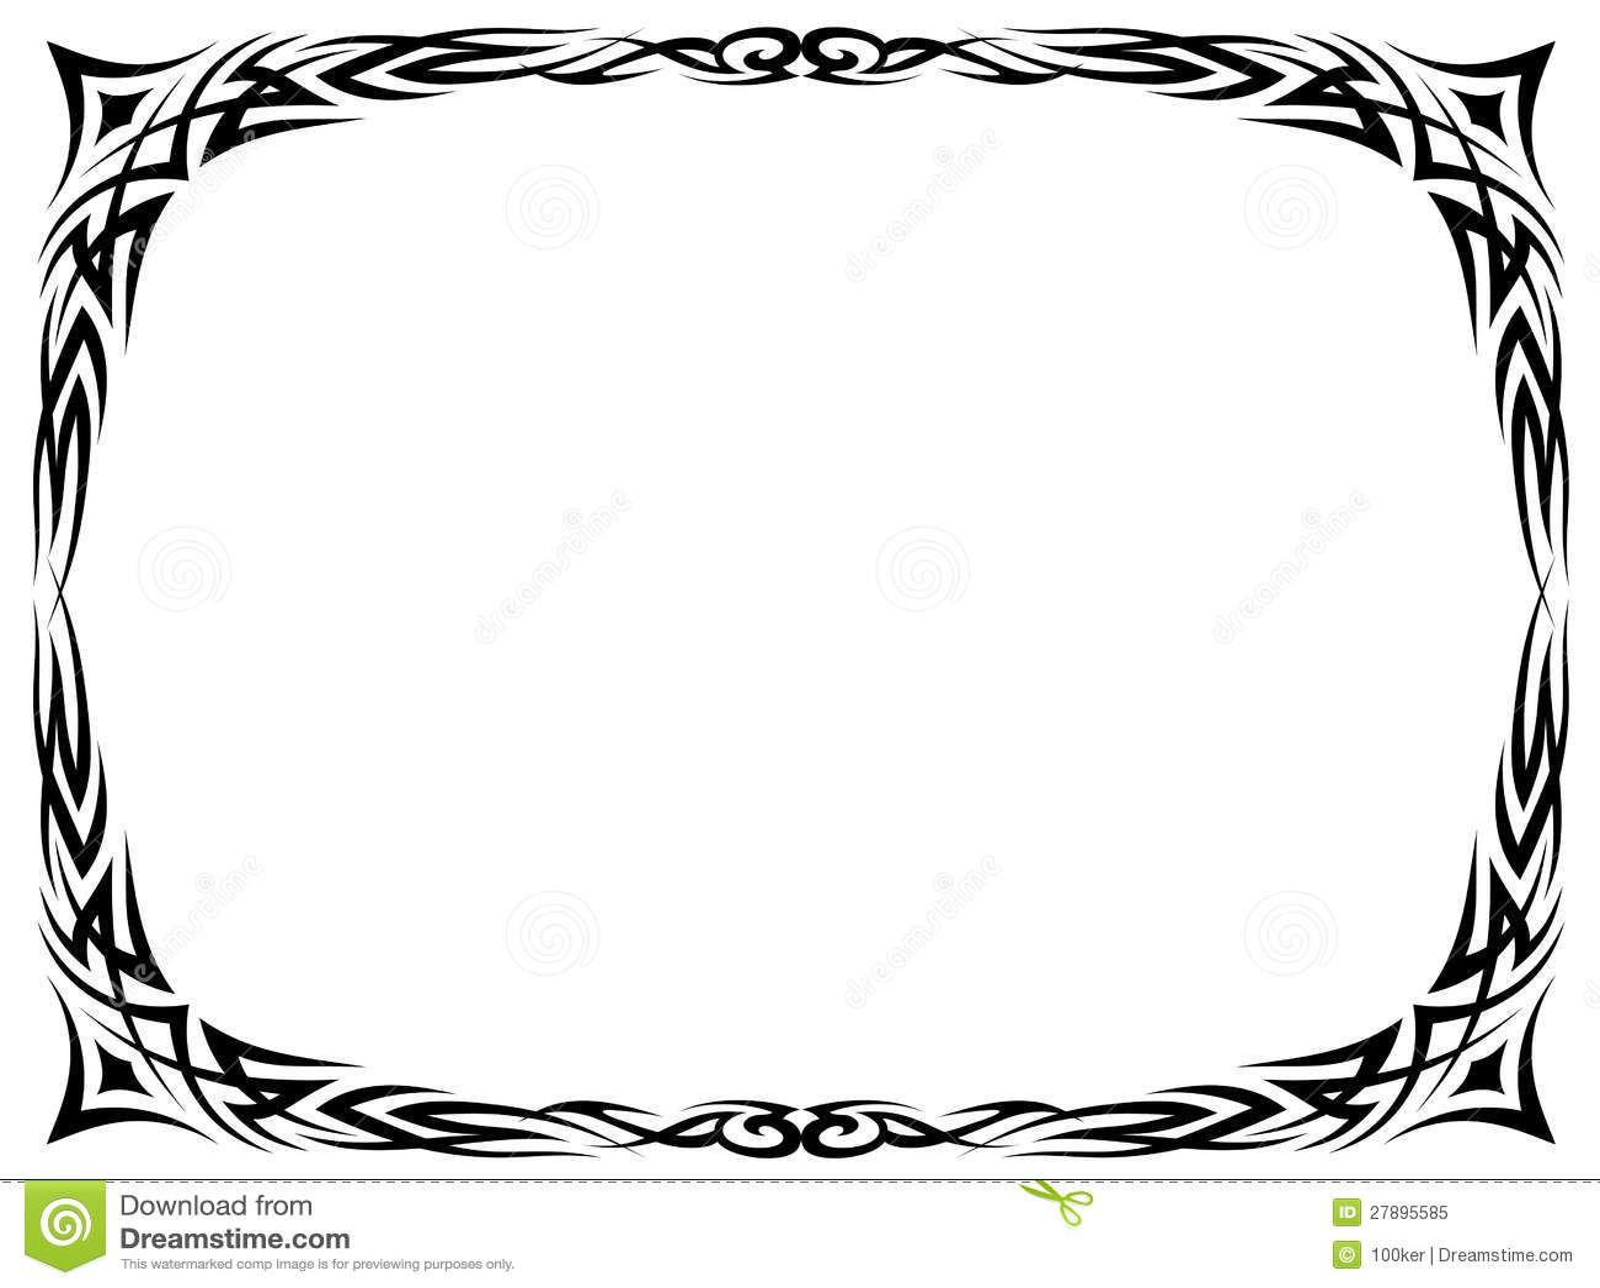 Simple Black Tattoo Ornamental Decorative Frame Stock